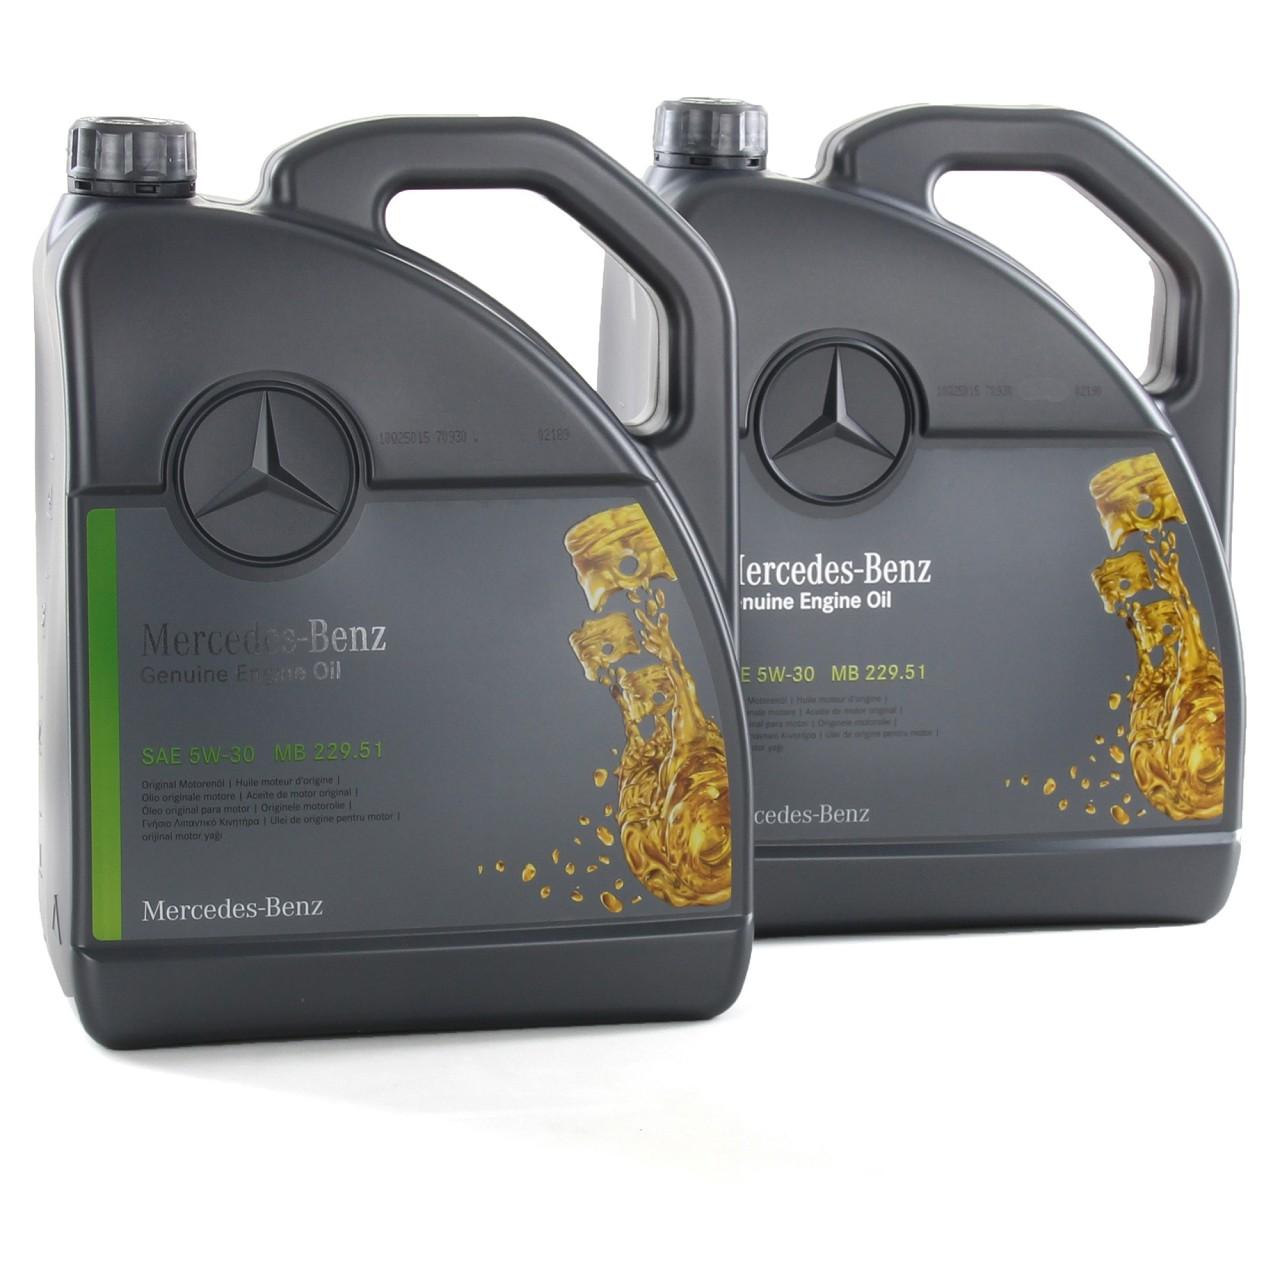 10 Liter ORIGINAL Mercedes-Benz Motoröl Öl 5W-30 5W30 MB 229.51 000989940213ALEE